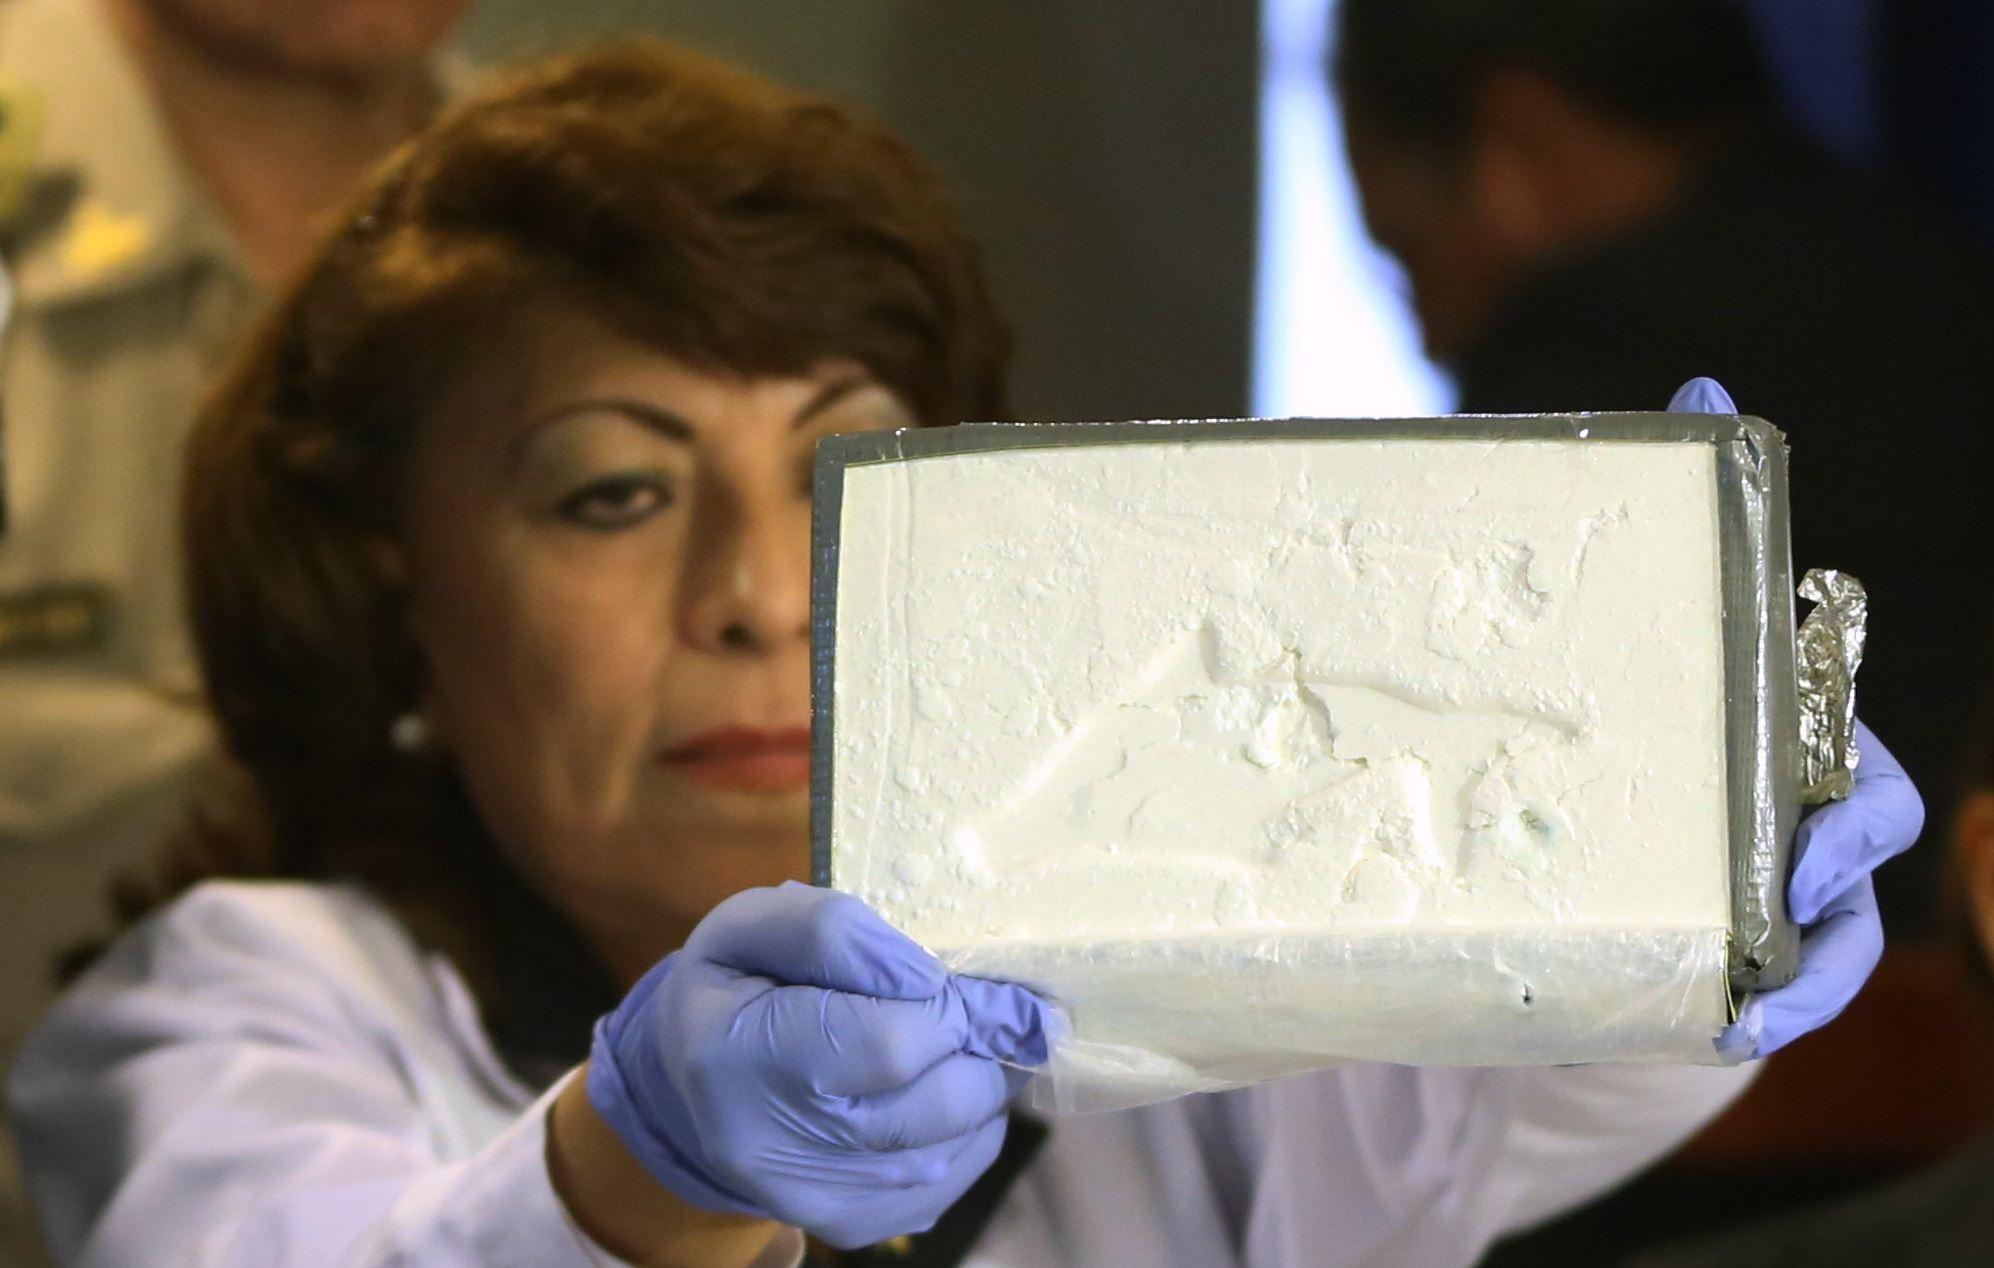 court  prosecutors must prove weight of cocaine  u2014 not